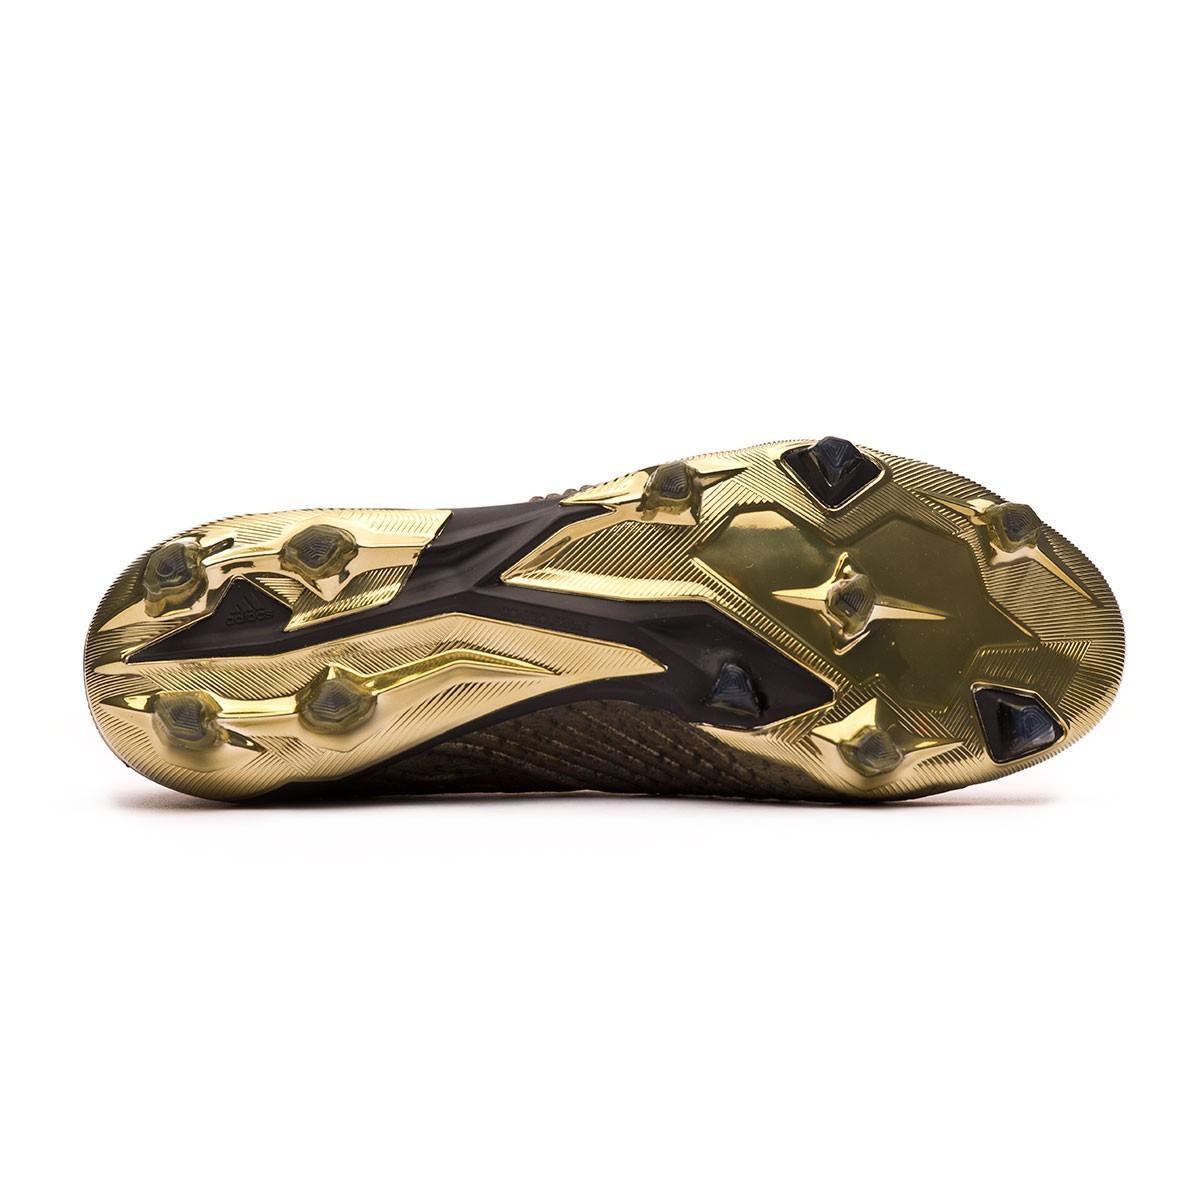 Chaussure de foot adidas Predator 18+ FG Pogba